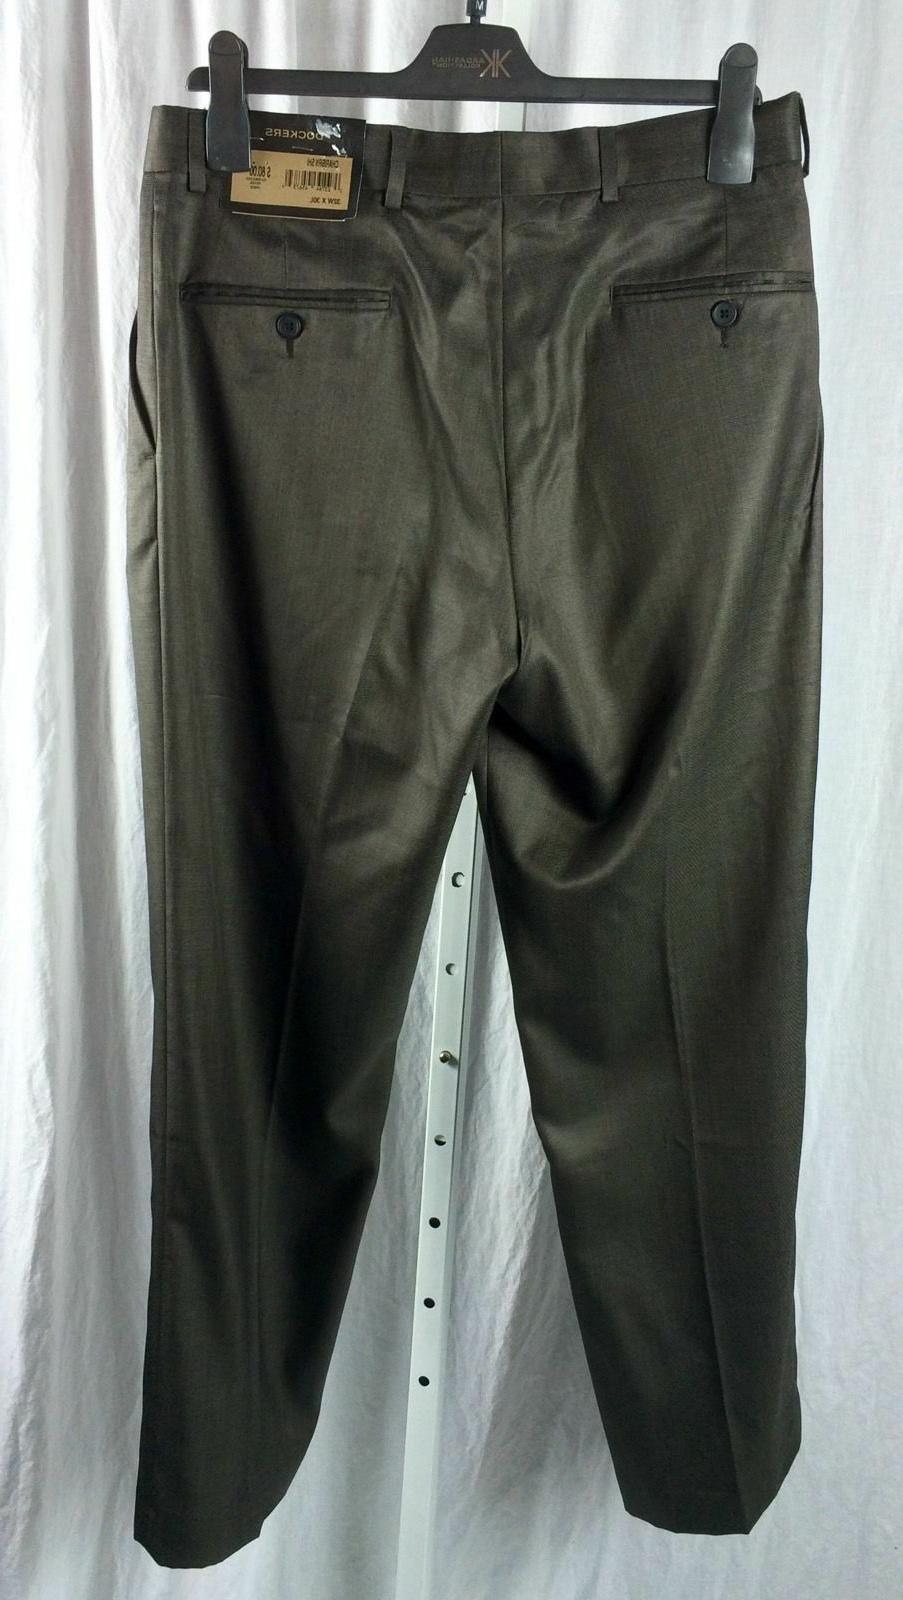 Mens Dockers Pants Size 44x30 Brown Blend NWT